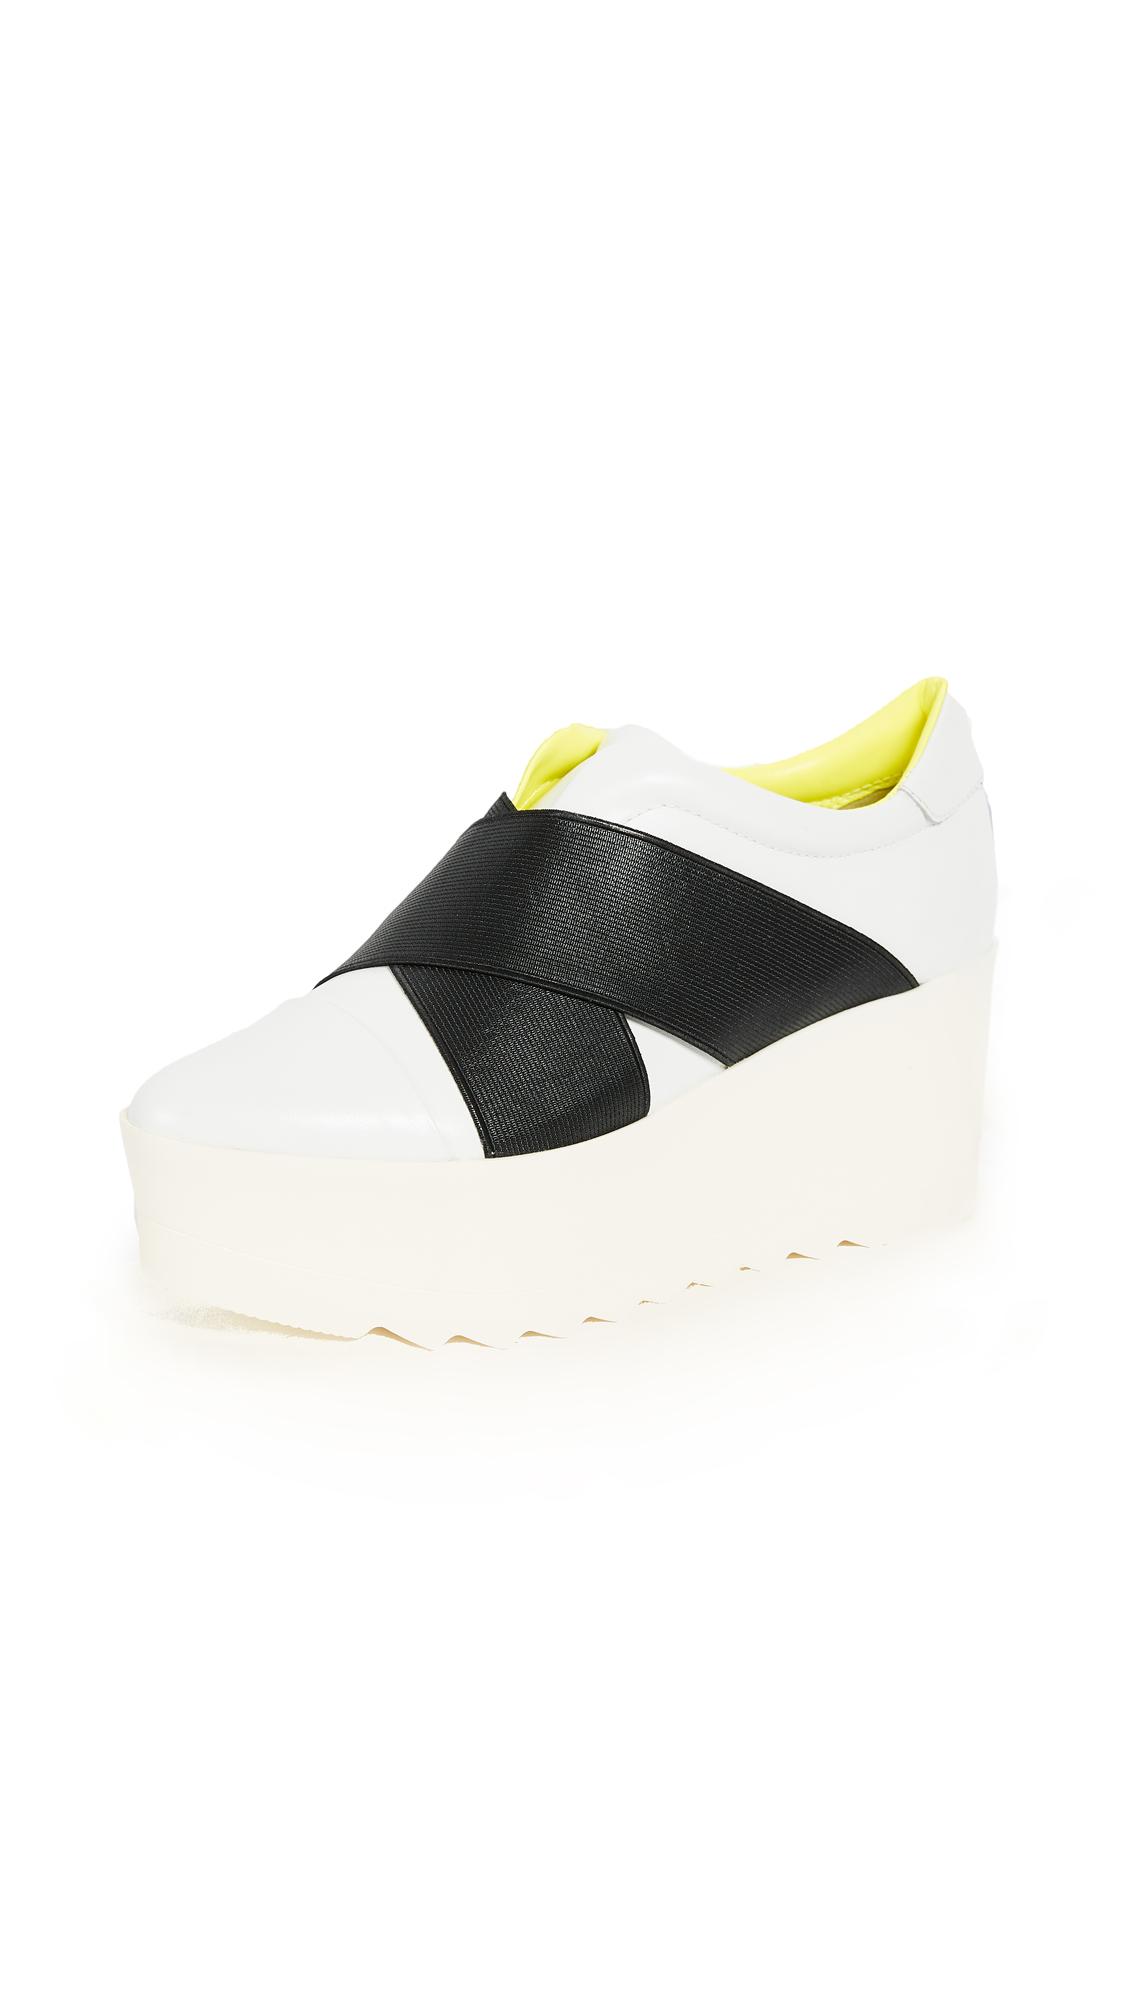 KENDALL + KYLIE Tasha Platform Flats - White